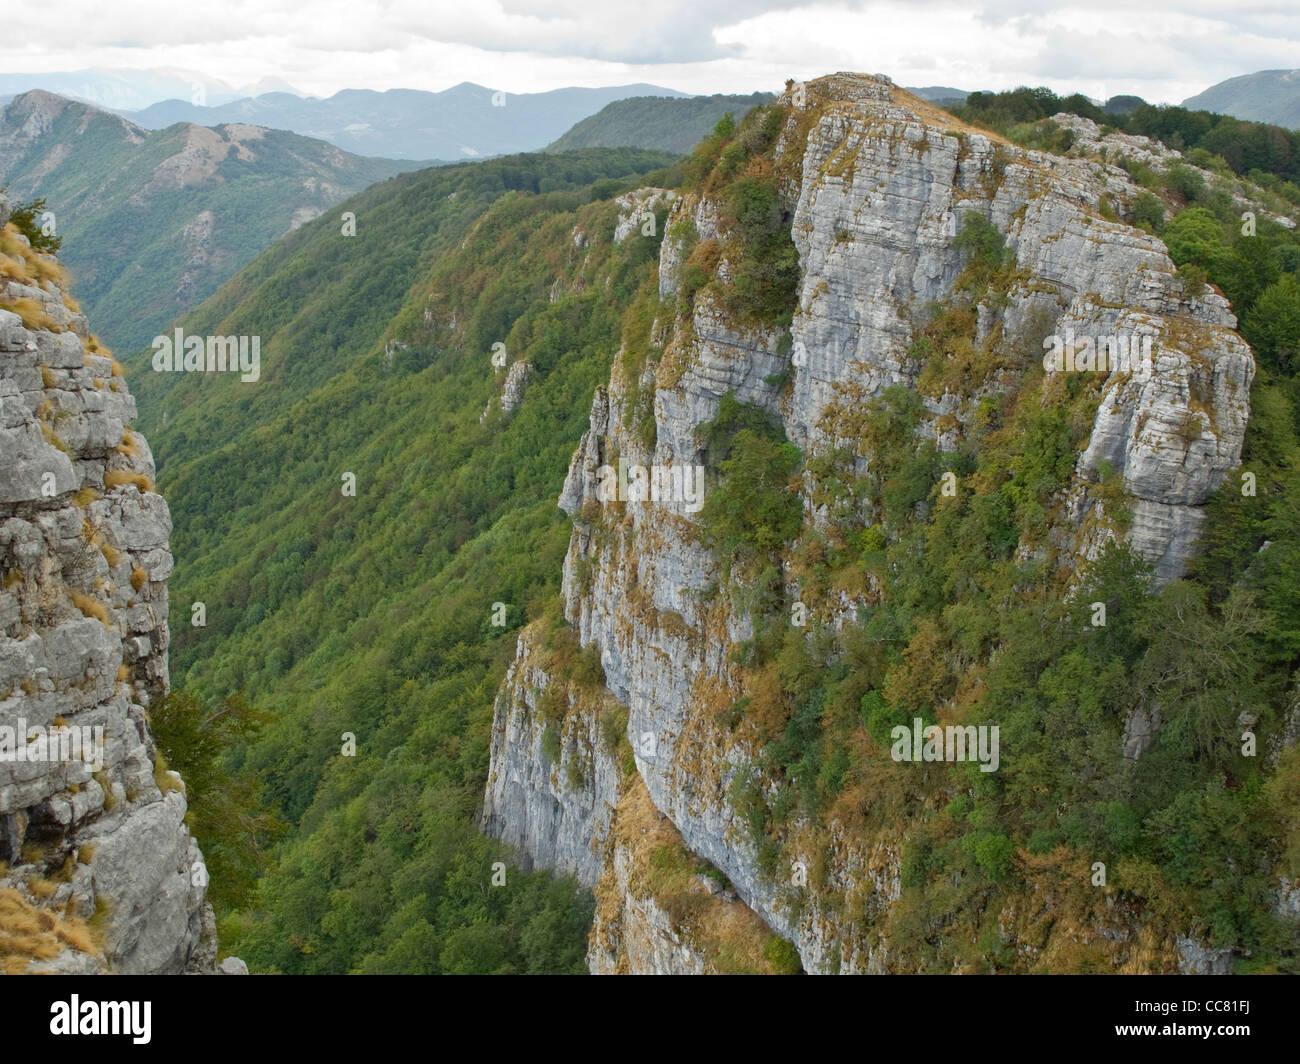 Kalksteinfelsen Alburni Berge, Nationalpark Cilento, Provinz Salerno, Region Kampanien, Süditalien Stockbild